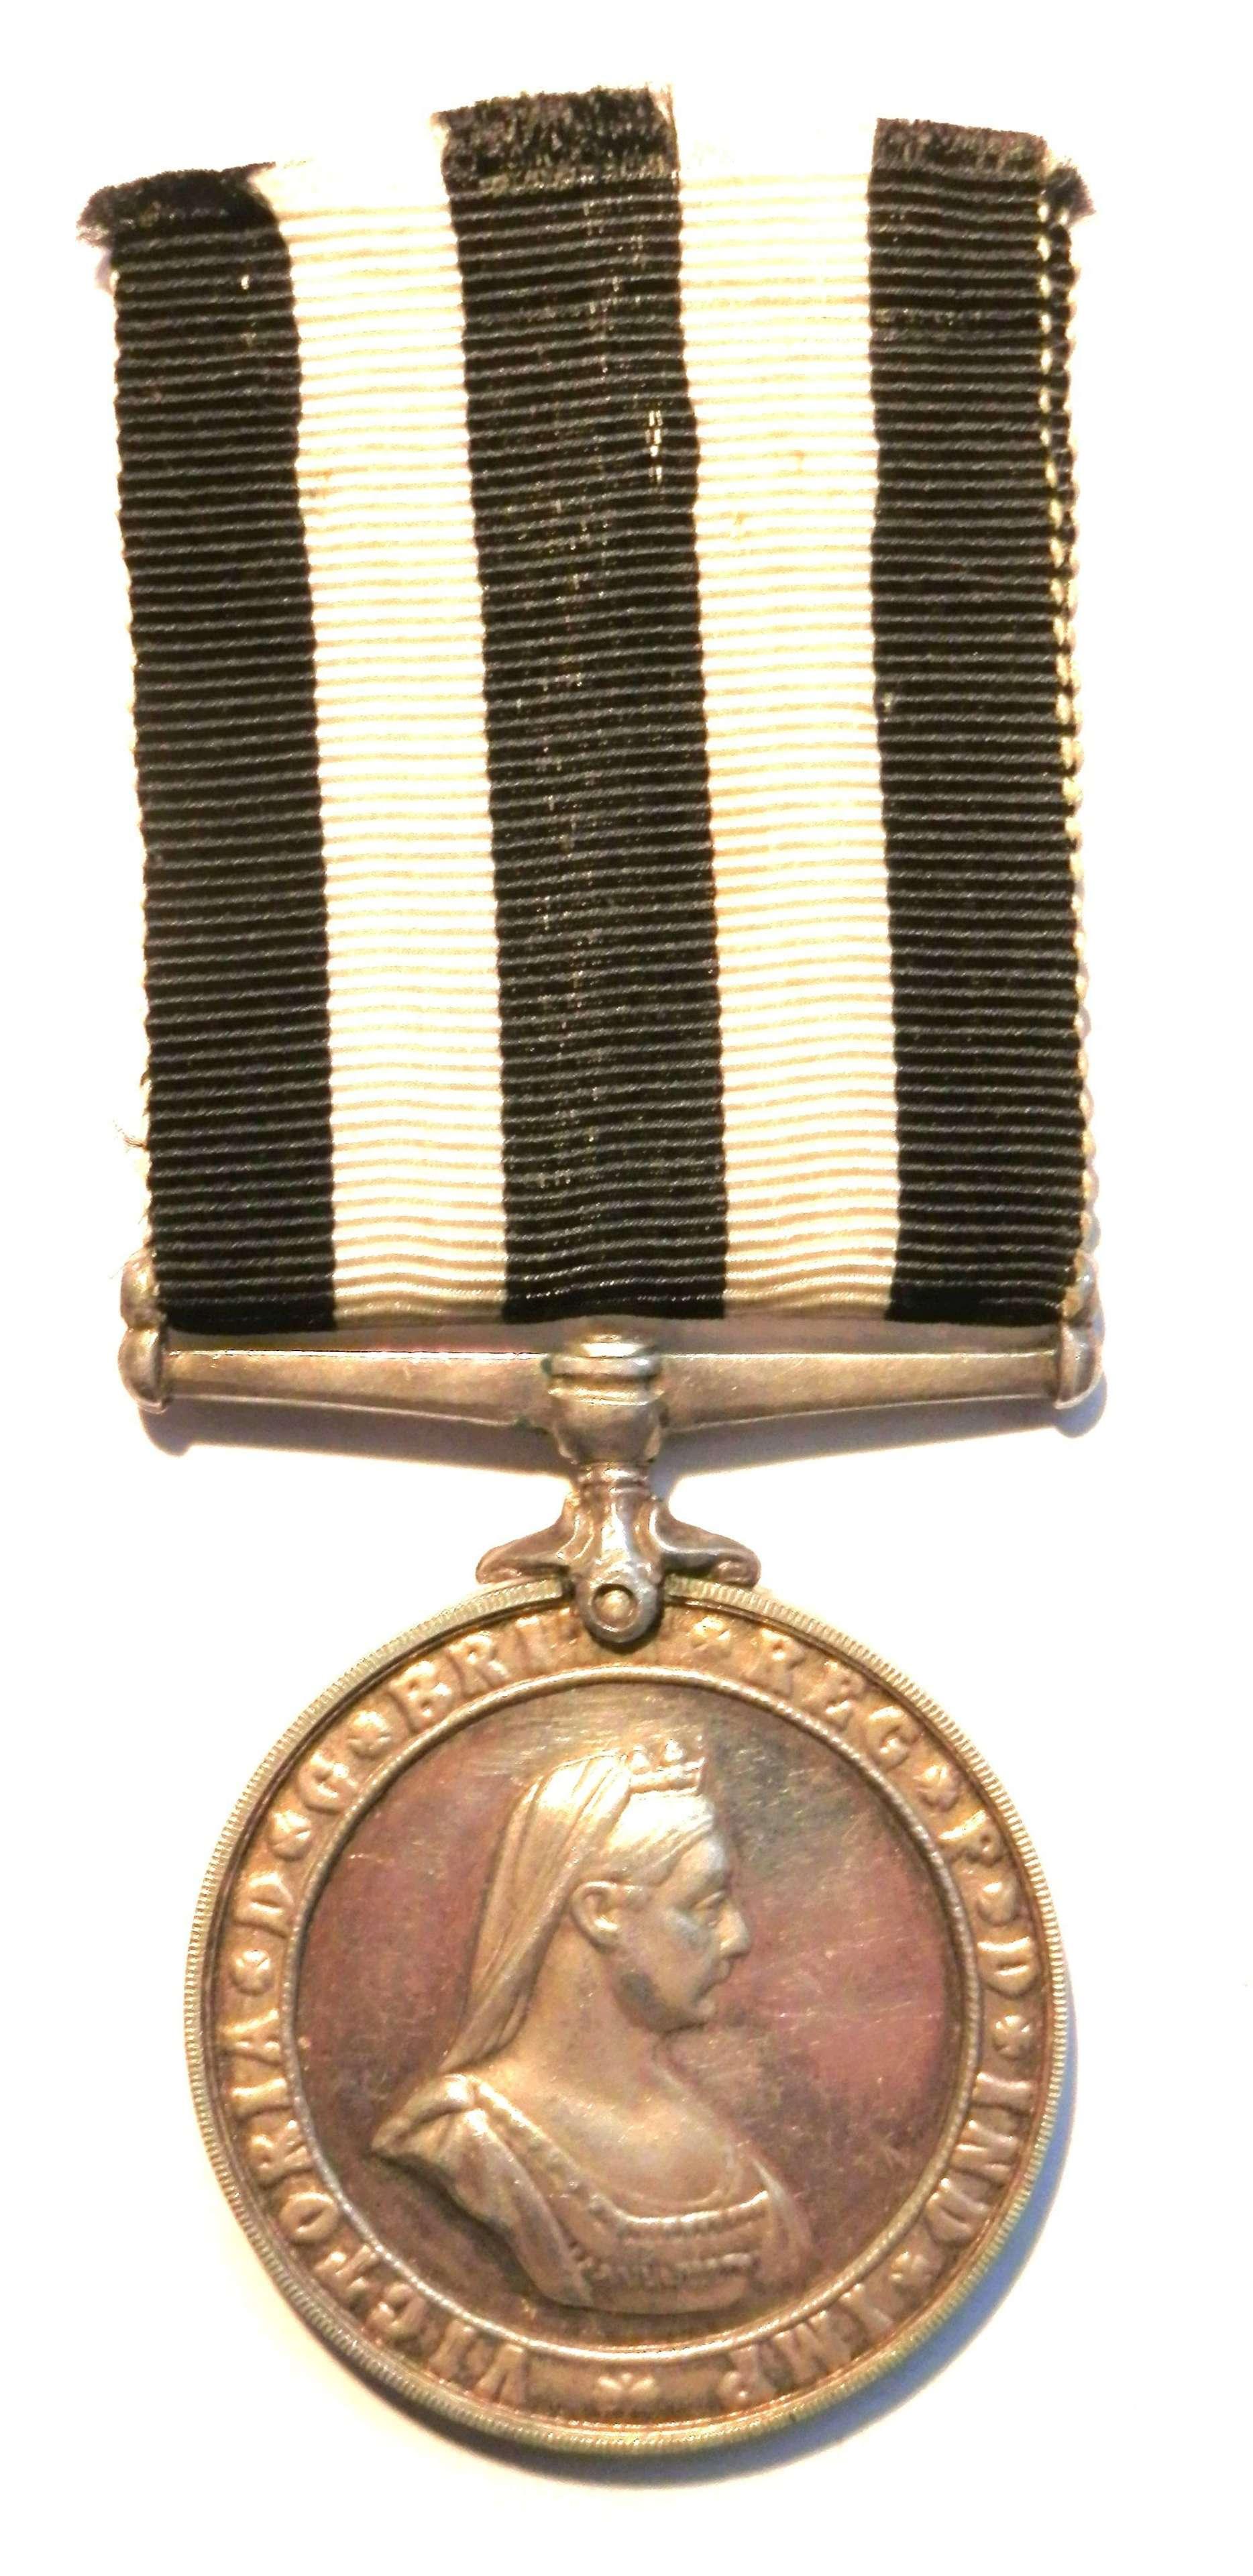 Service Medal Order of St Johns. D/Supt. E. G. Rogers.